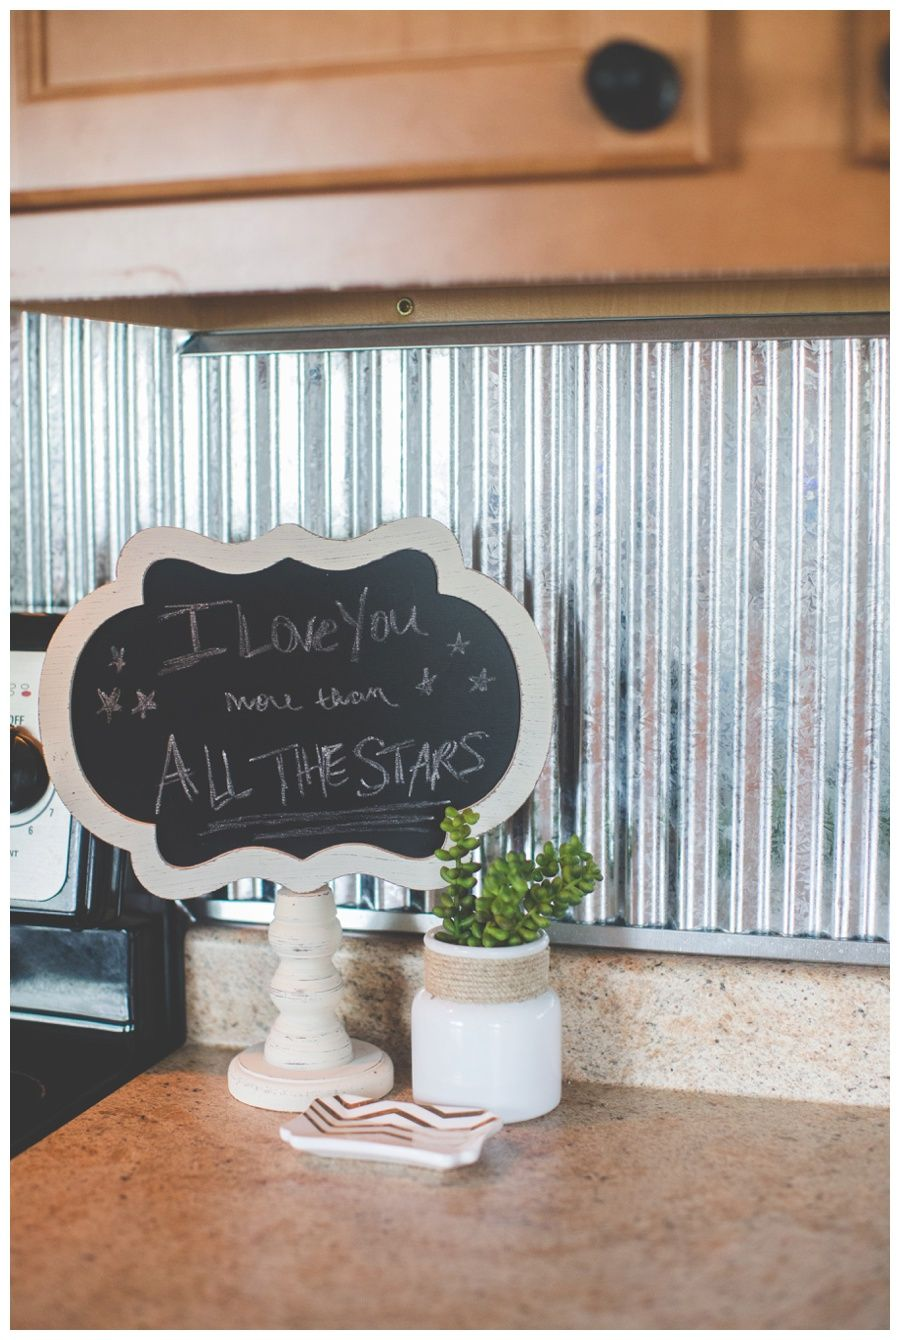 Corrugated Metal Backsplash For The Home Rustic